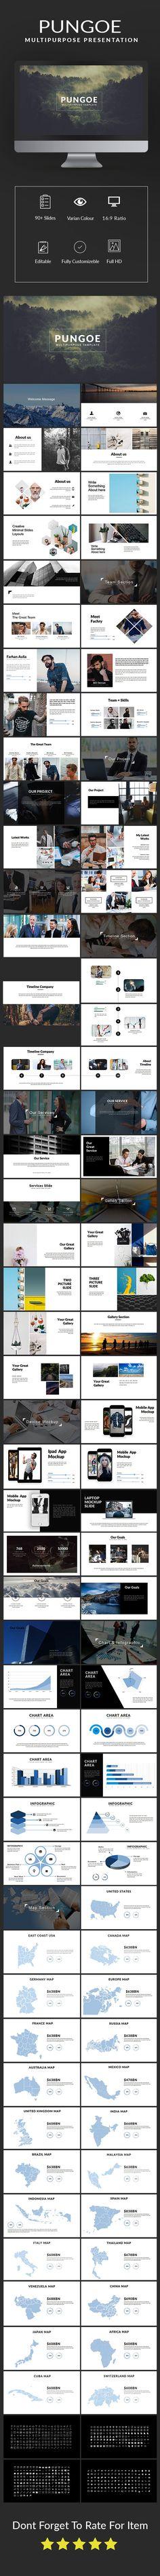 Square Google Slides - Google Slides Presentation Templates ...